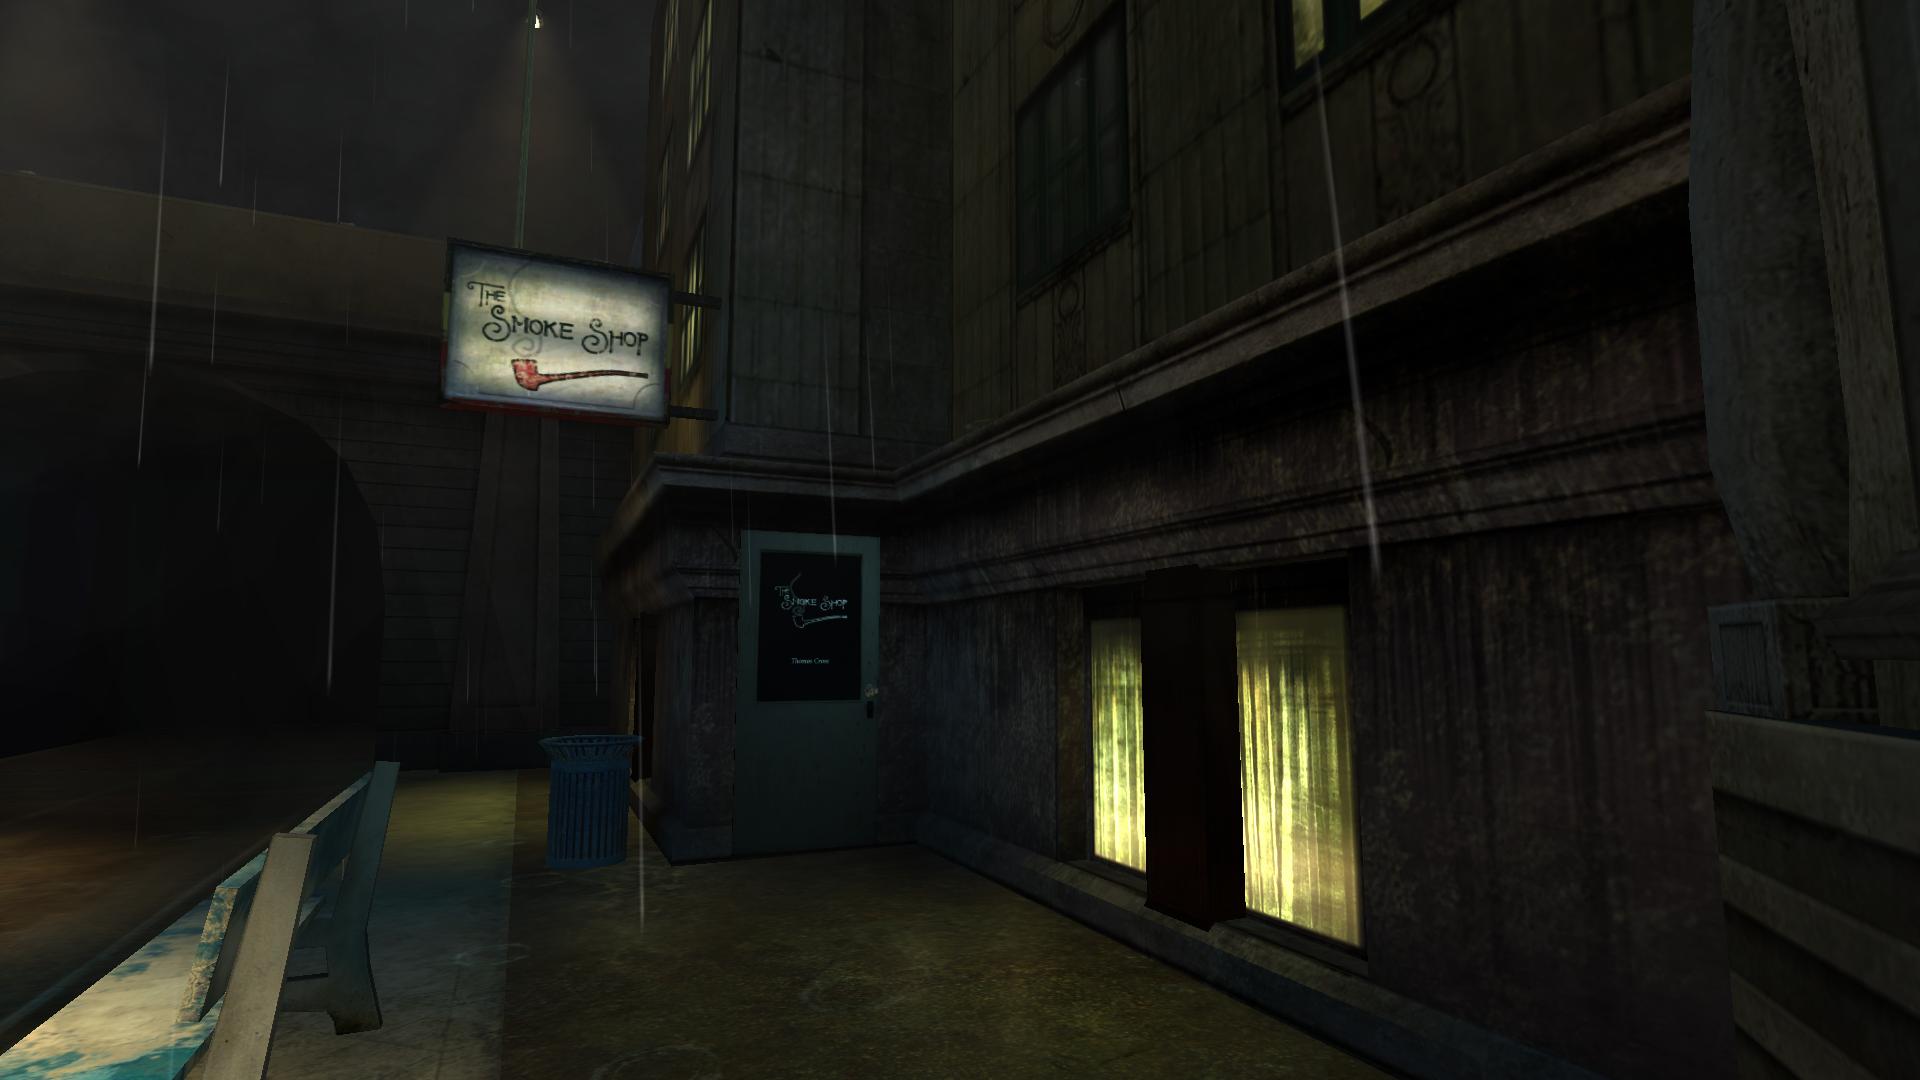 The Smoke Shop Vampire The Masquerade Bloodlines Wiki Fandom